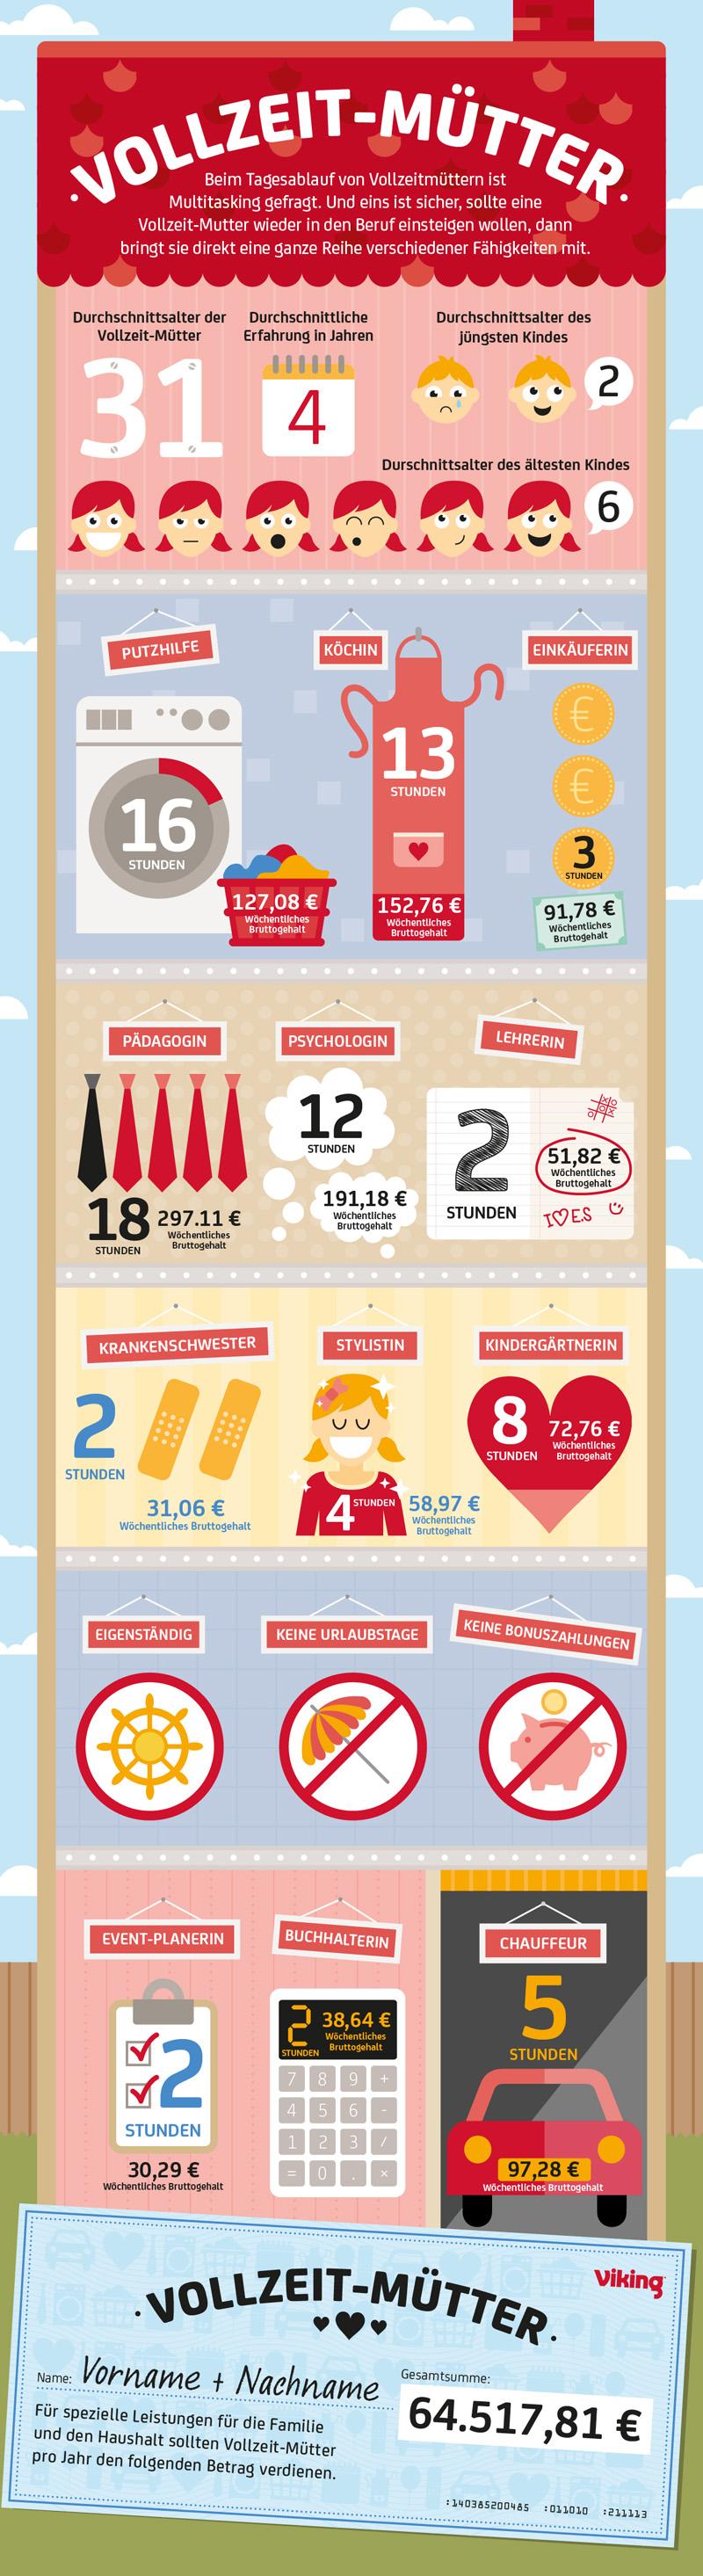 Infografik Vollzeit-Mütter